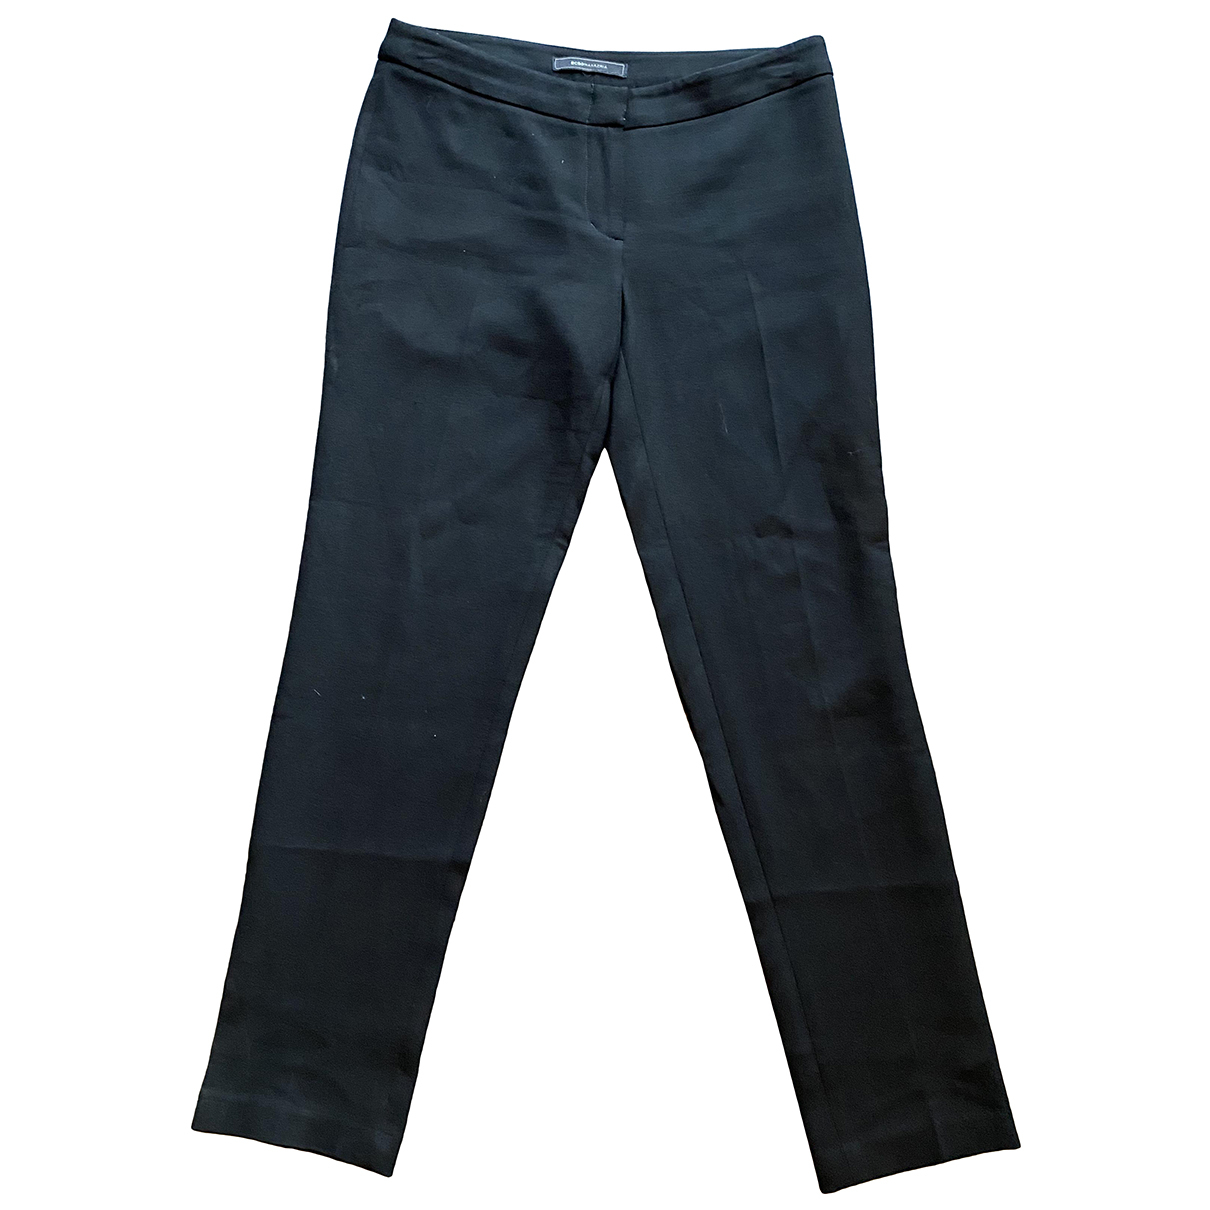 Bcbg Max Azria N Black Trousers for Women 38 FR